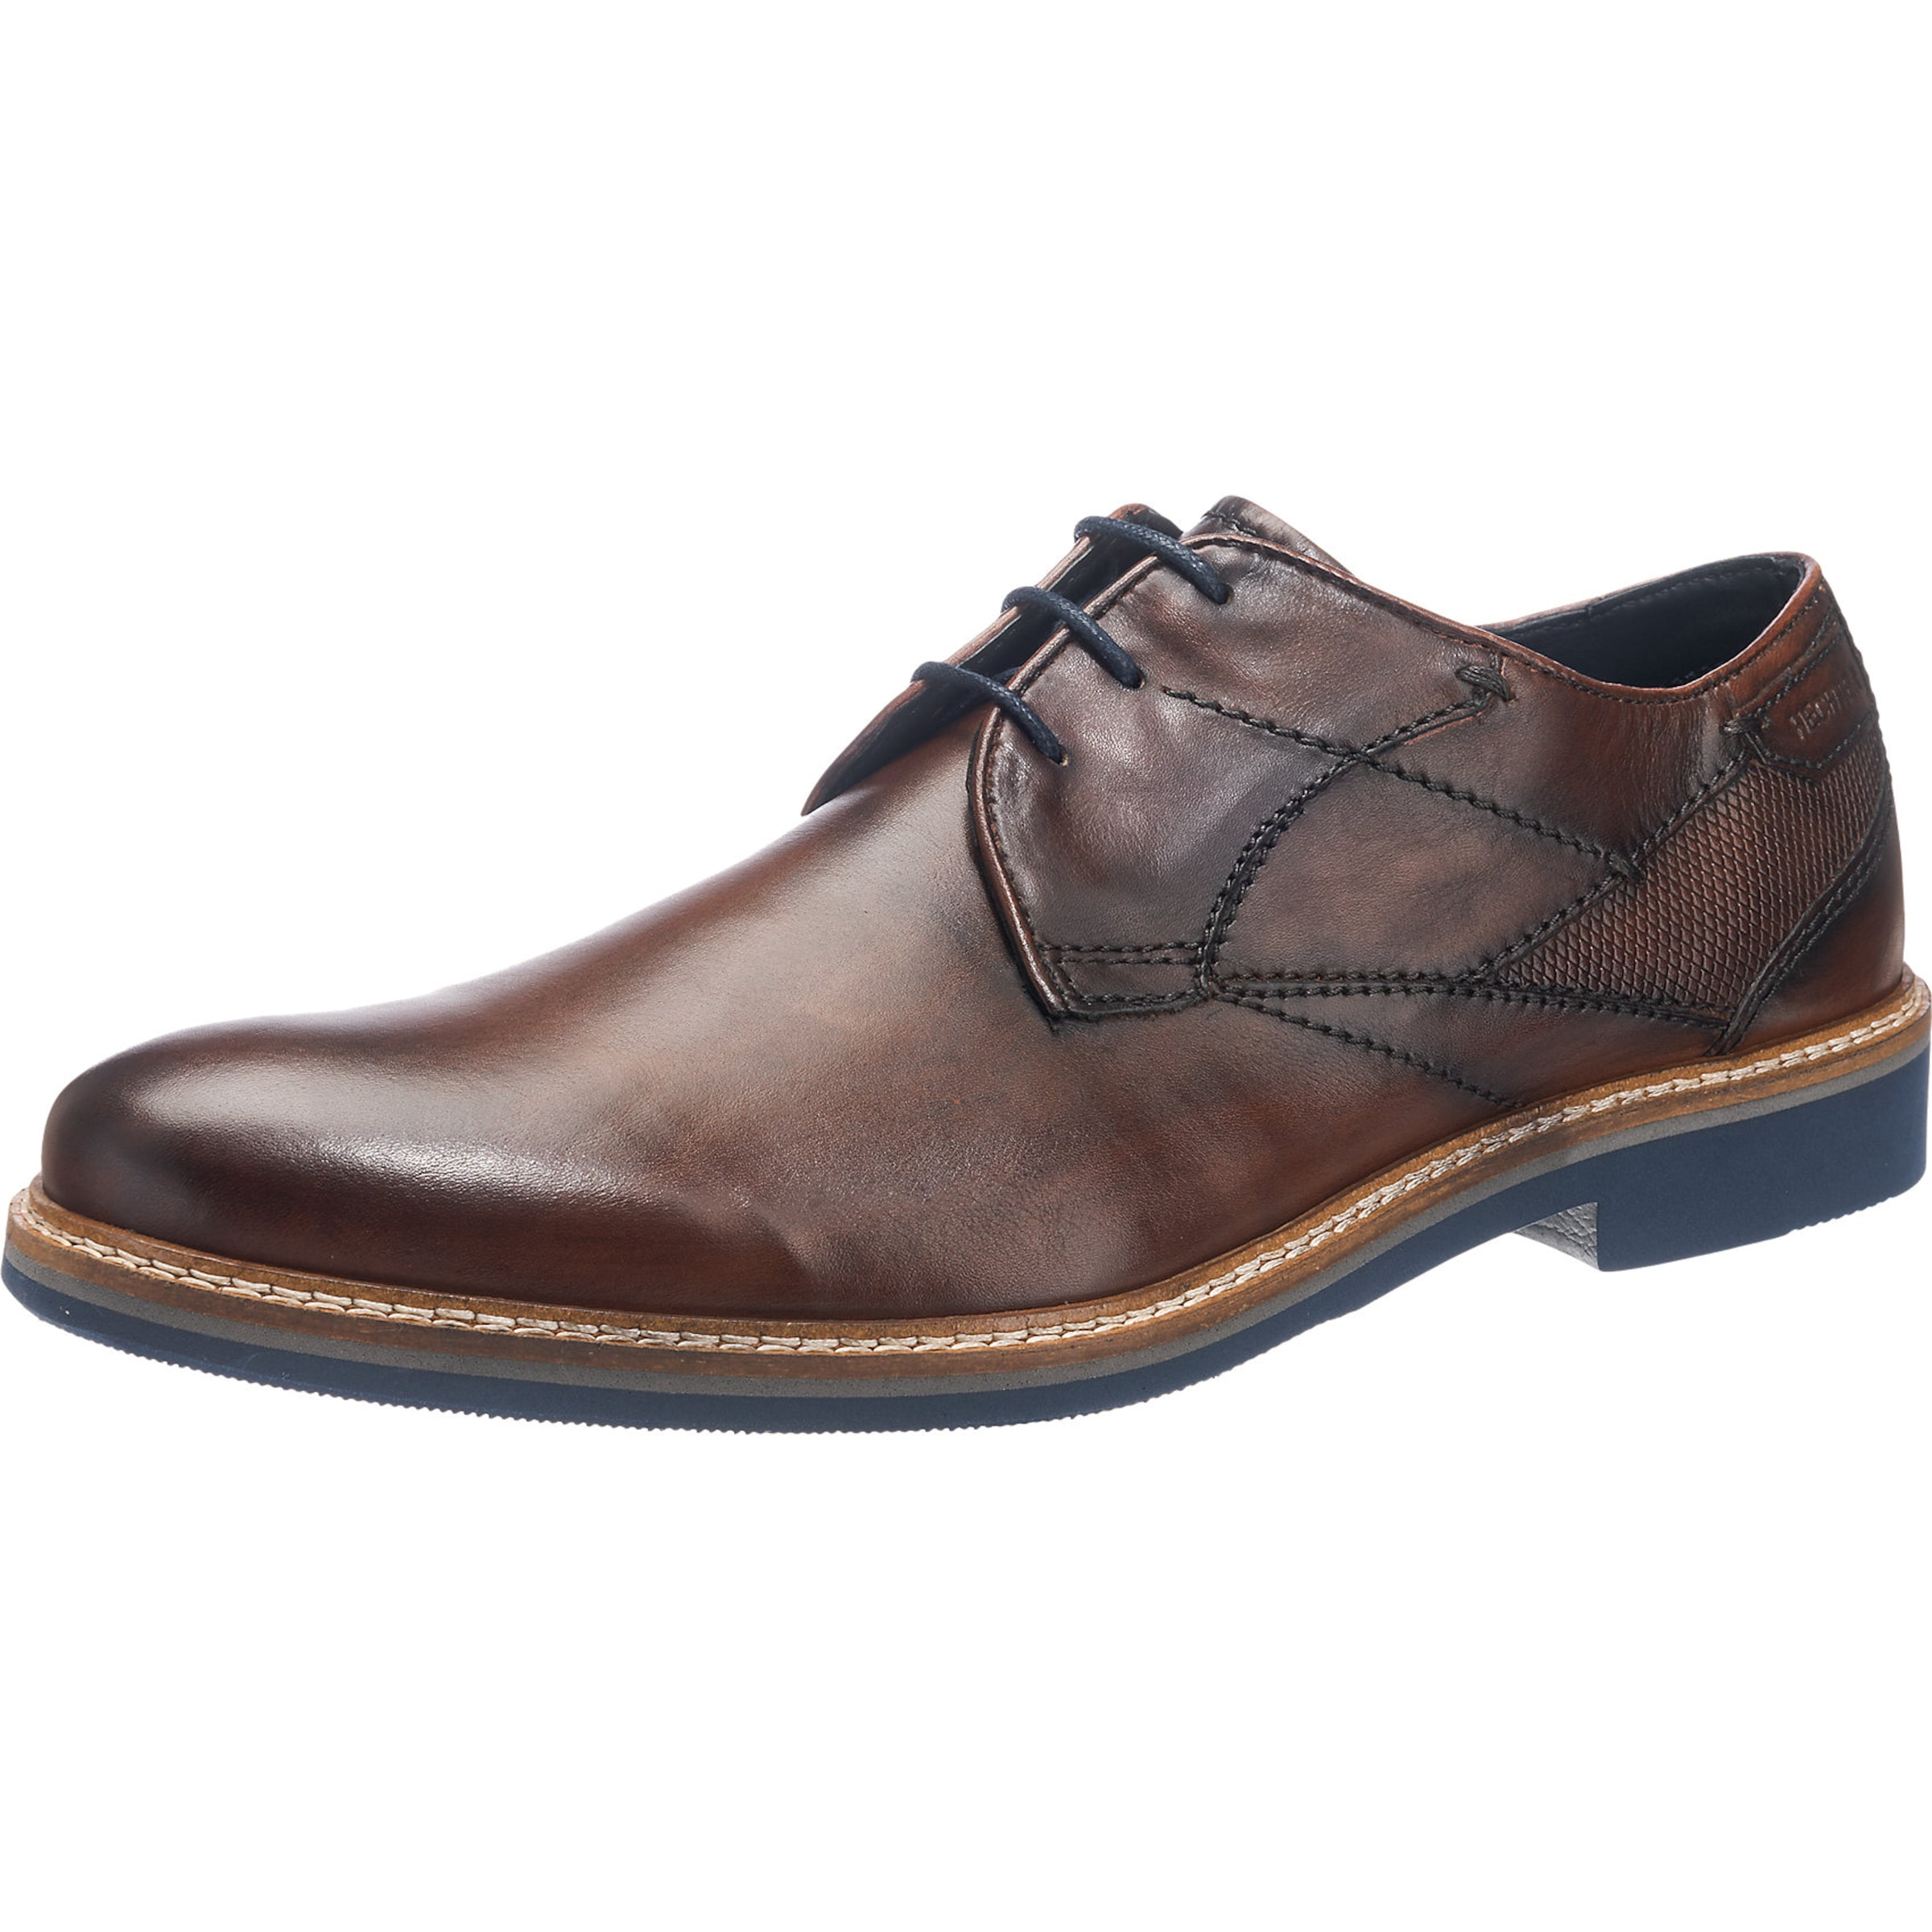 DANIEL HECHTER Business-Schuhe Günstige und langlebige Schuhe